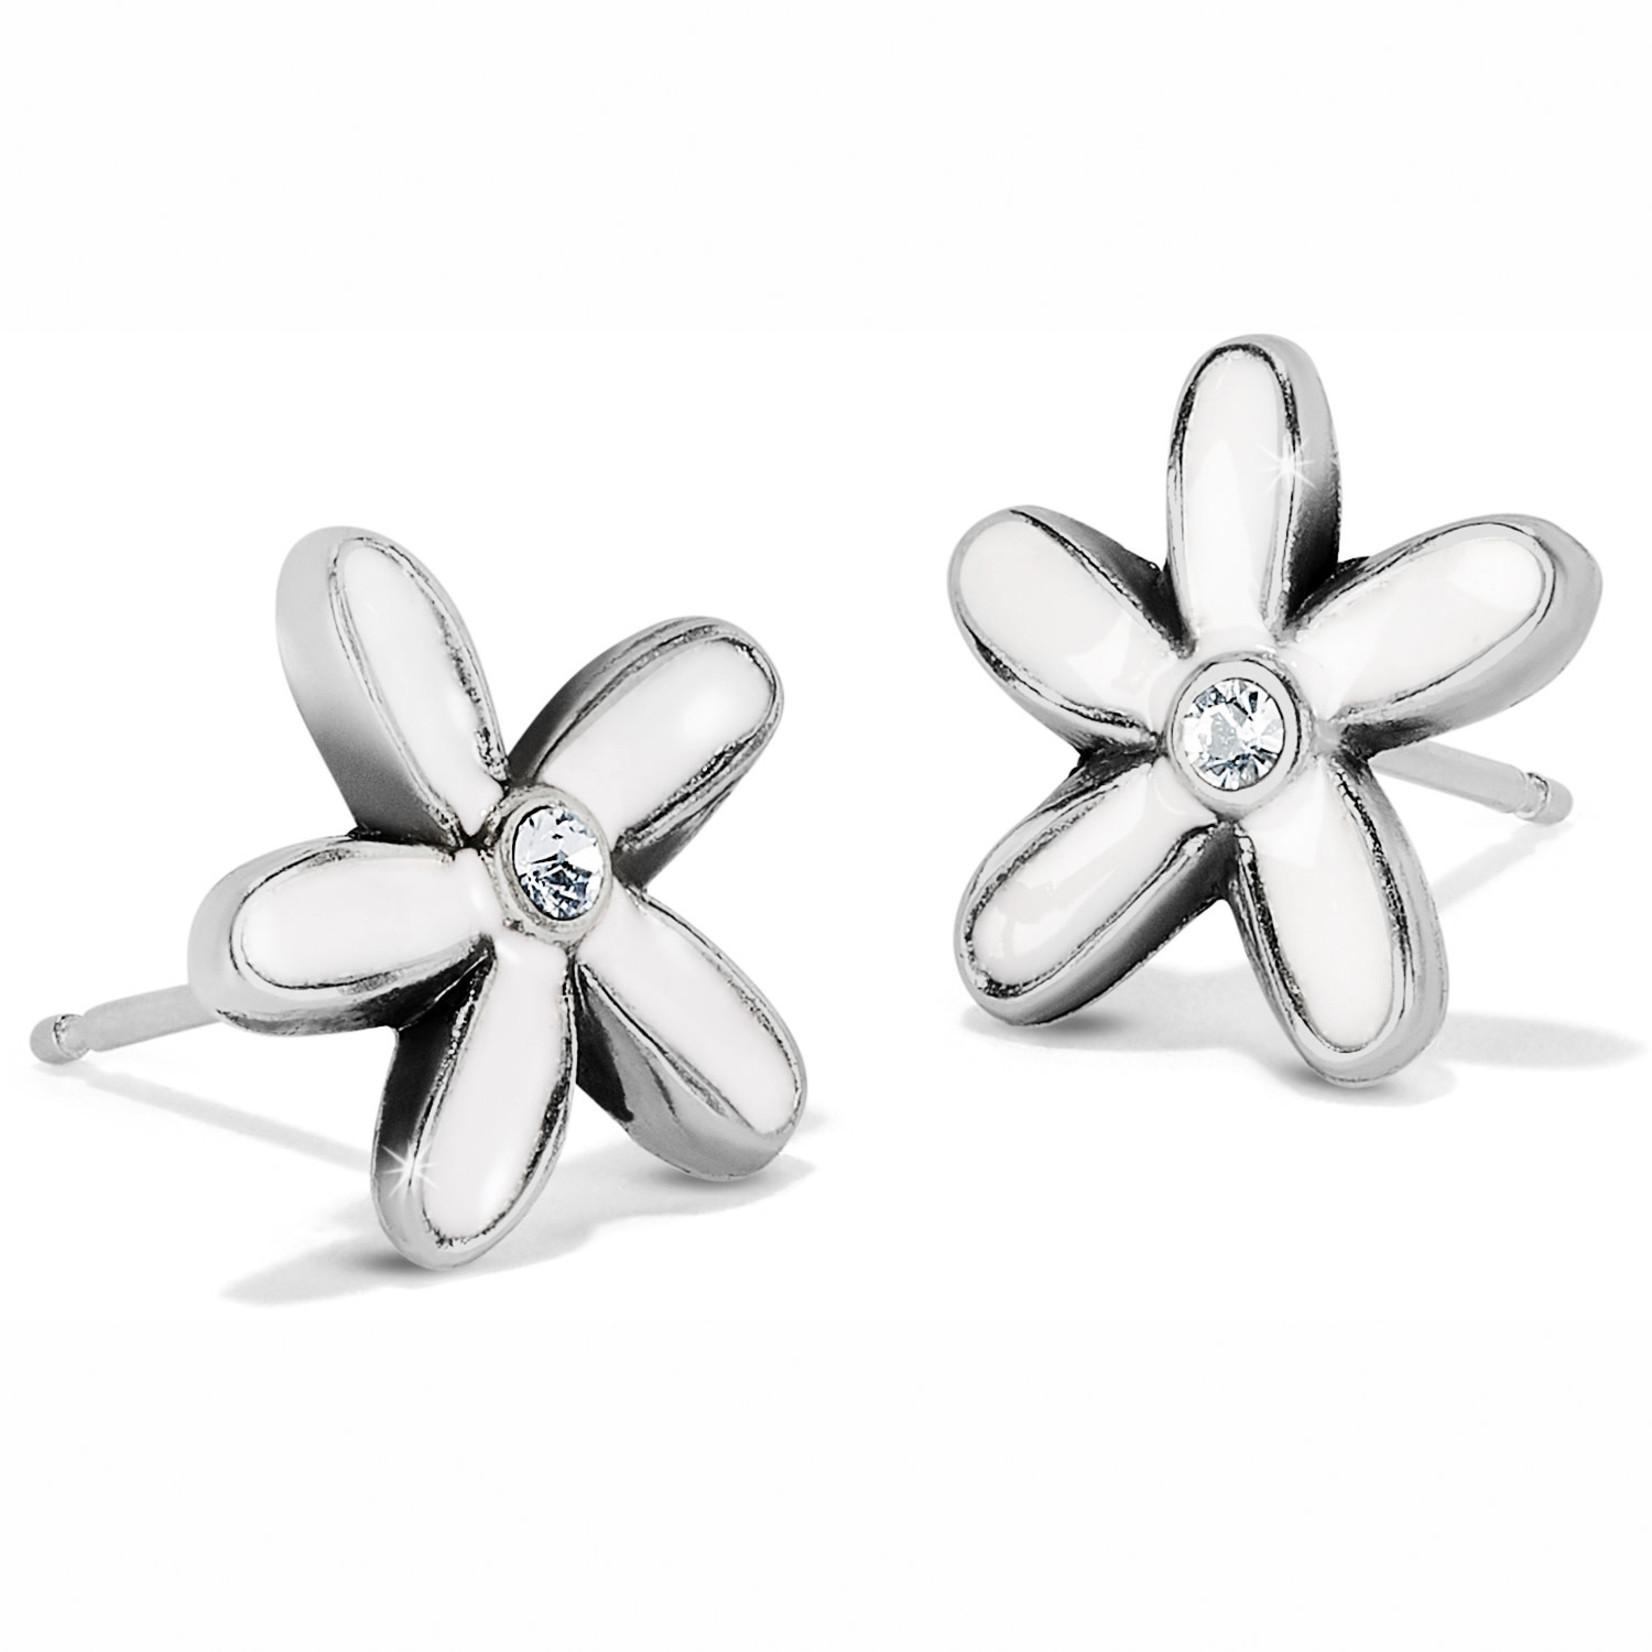 Brighton J22343 Fashionista Love Bouquet Mini Post Earrings